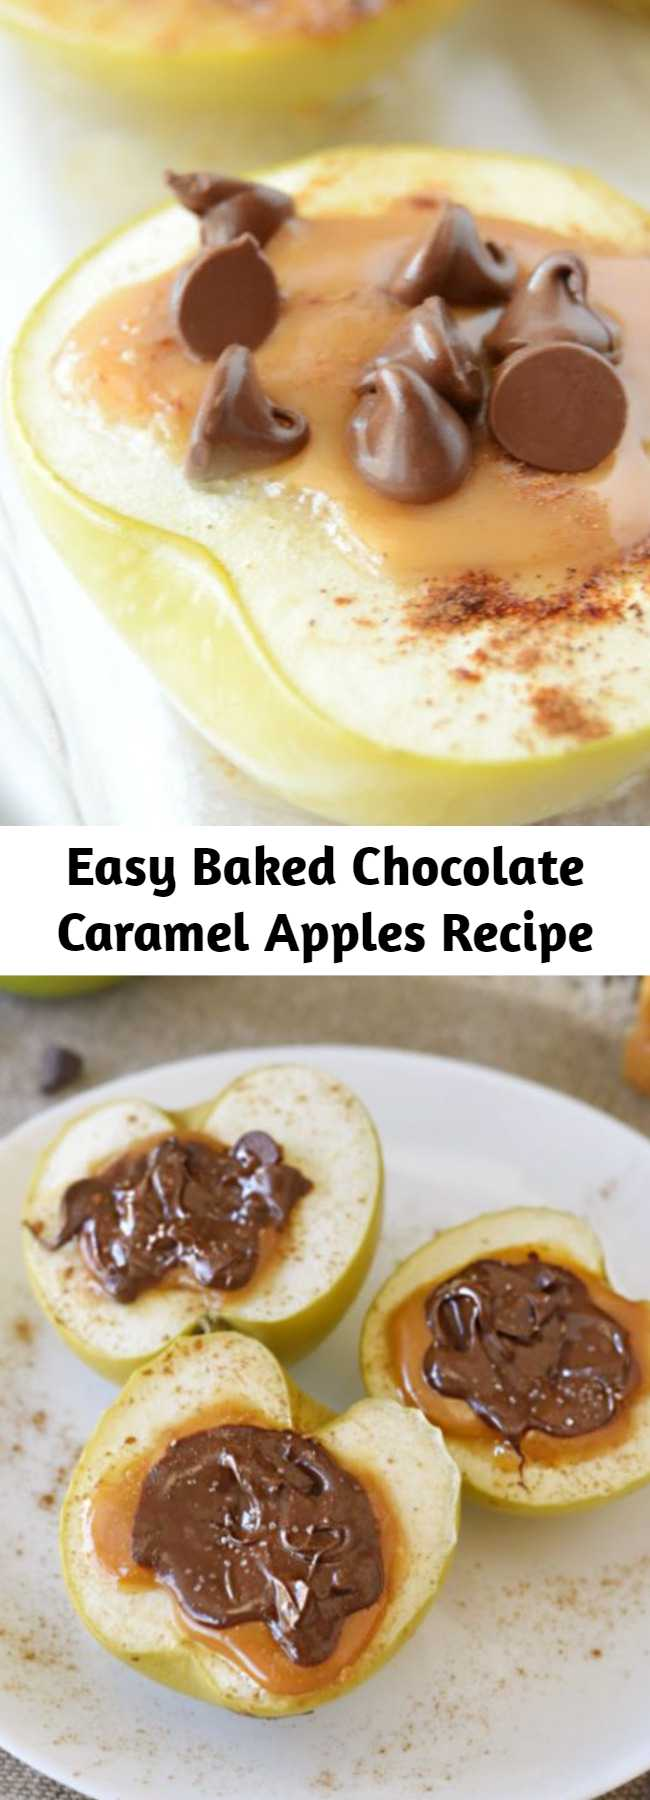 Easy Baked Chocolate Caramel Apples Recipe - Baked Chocolate Caramel Apples are baked apples stuffed with caramel and topped with chocolate and sea salt. An easy fall dessert recipe!